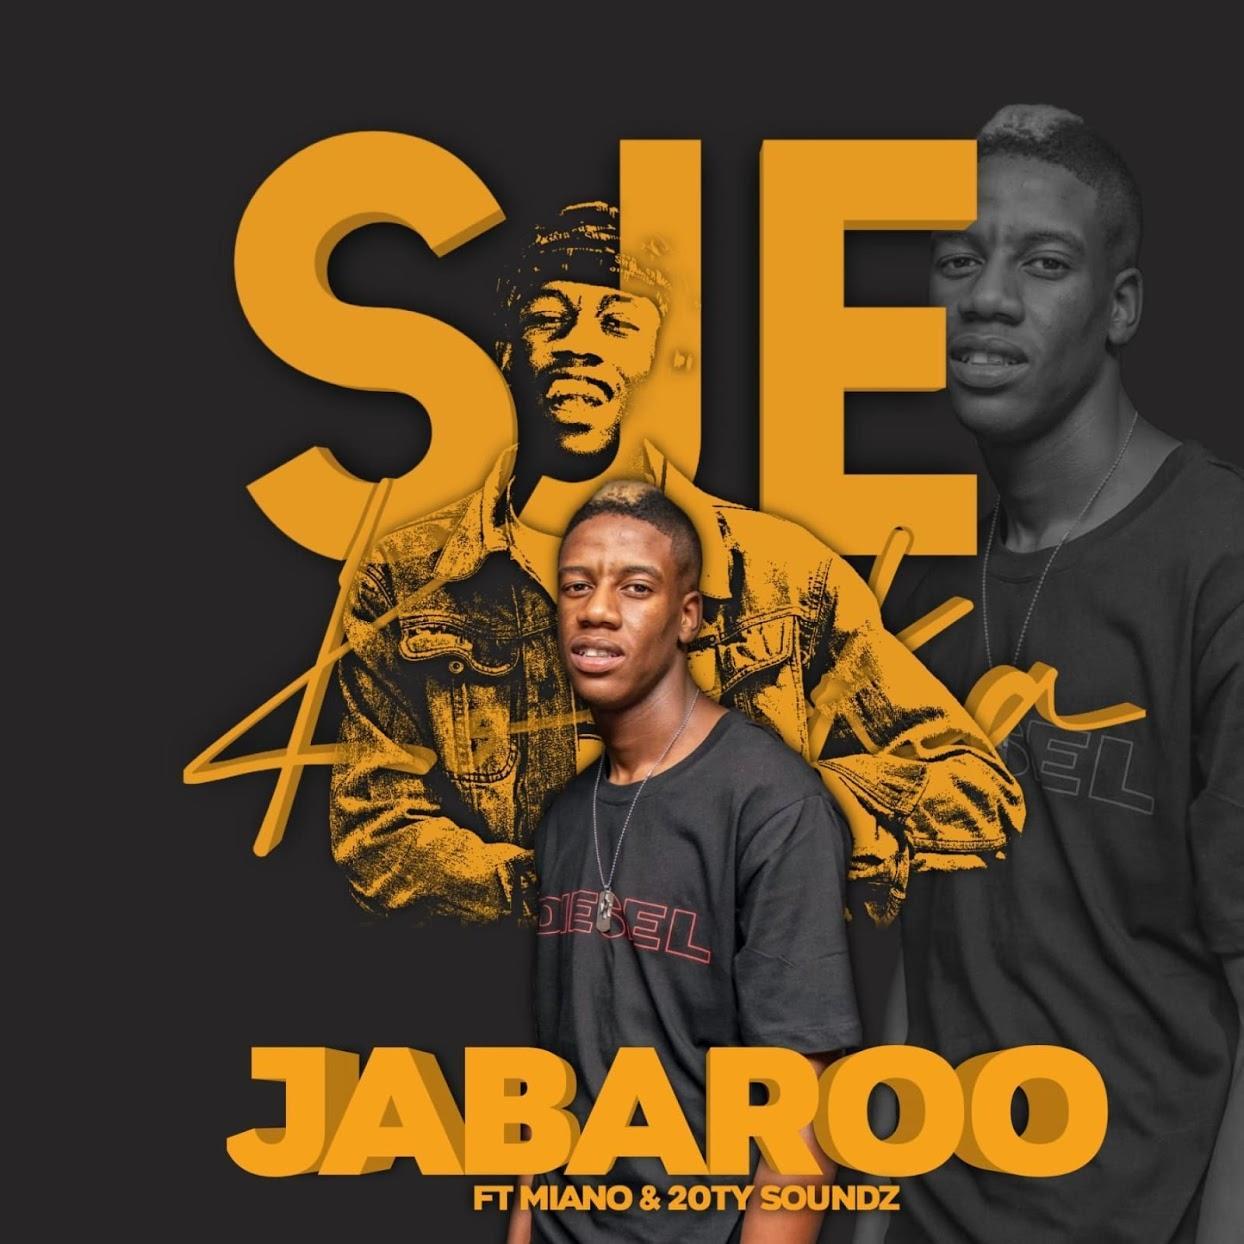 Sje Konka - Jabaroo (feat. Miano & 20ty Soundz)